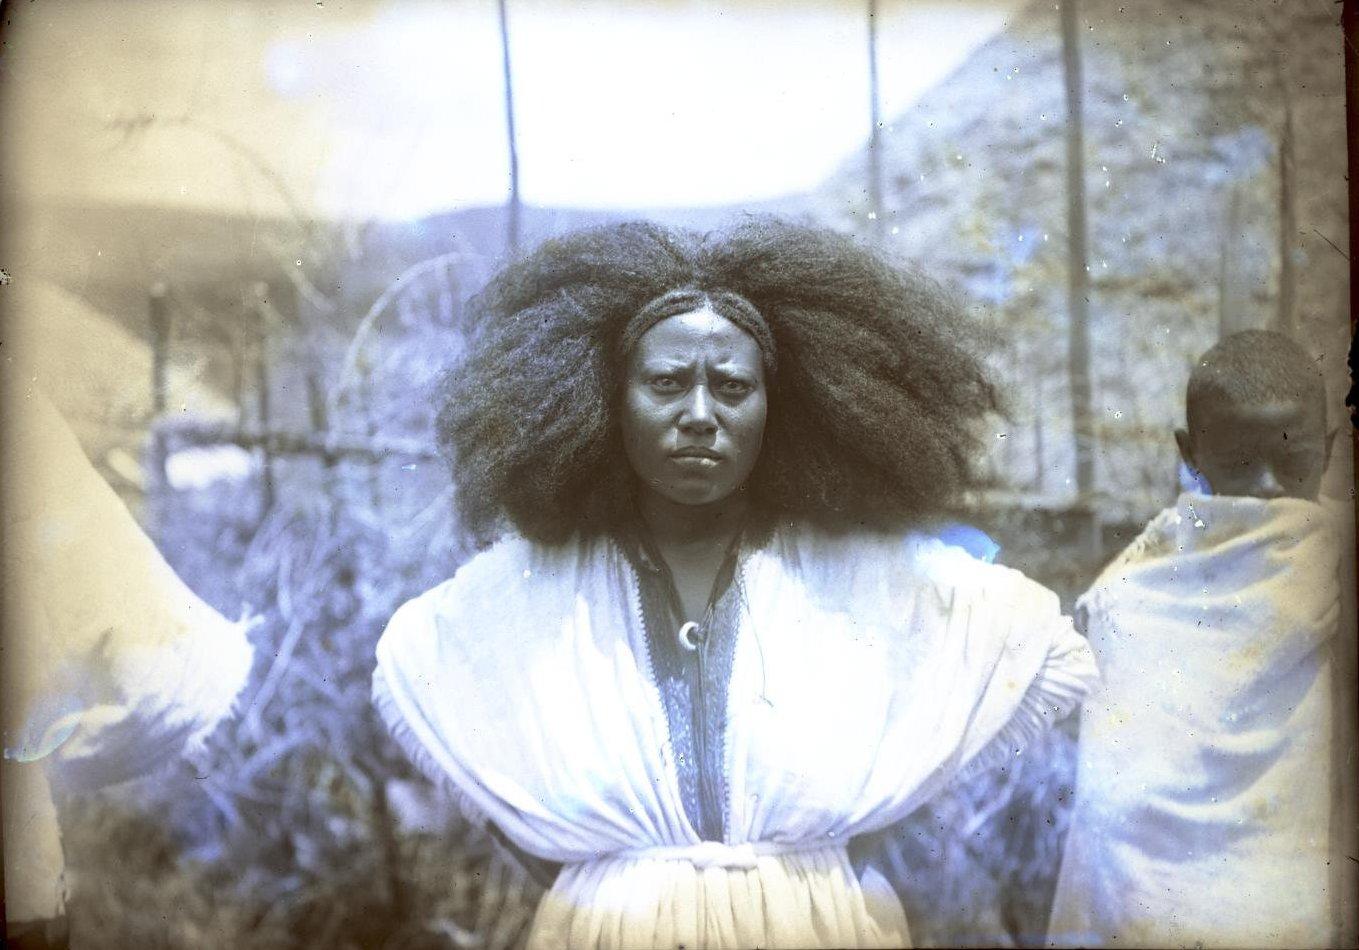 373. 1899. Абиссиния, Аддис-Абеба. Жена господина Гано